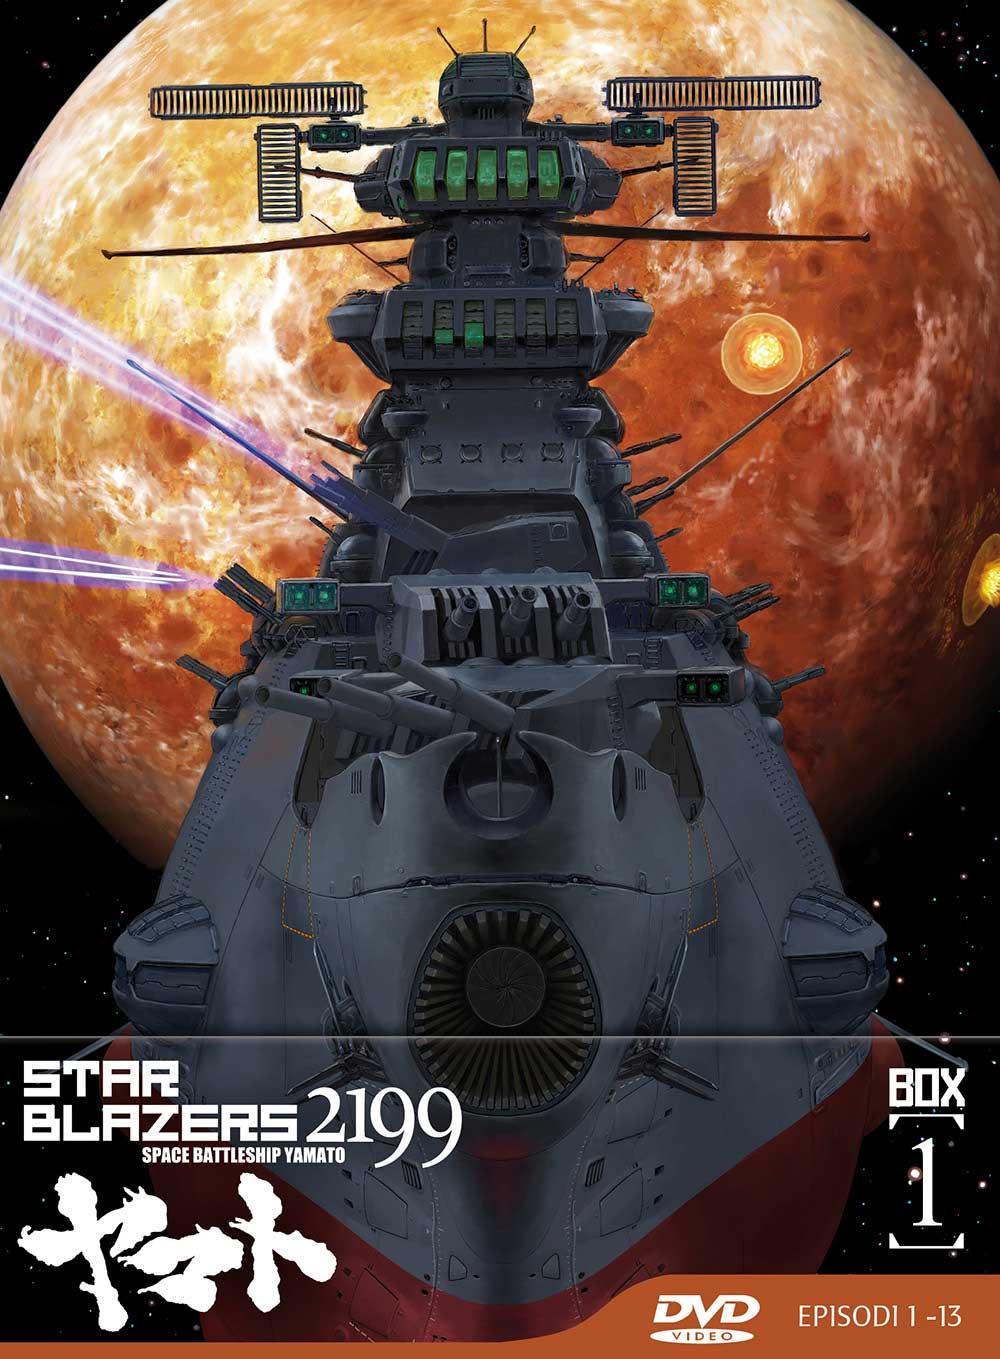 COF.STAR BLAZERS 2199 - SERIE COMPLETA (EPS 01-26) (LTD) (6 DVD)